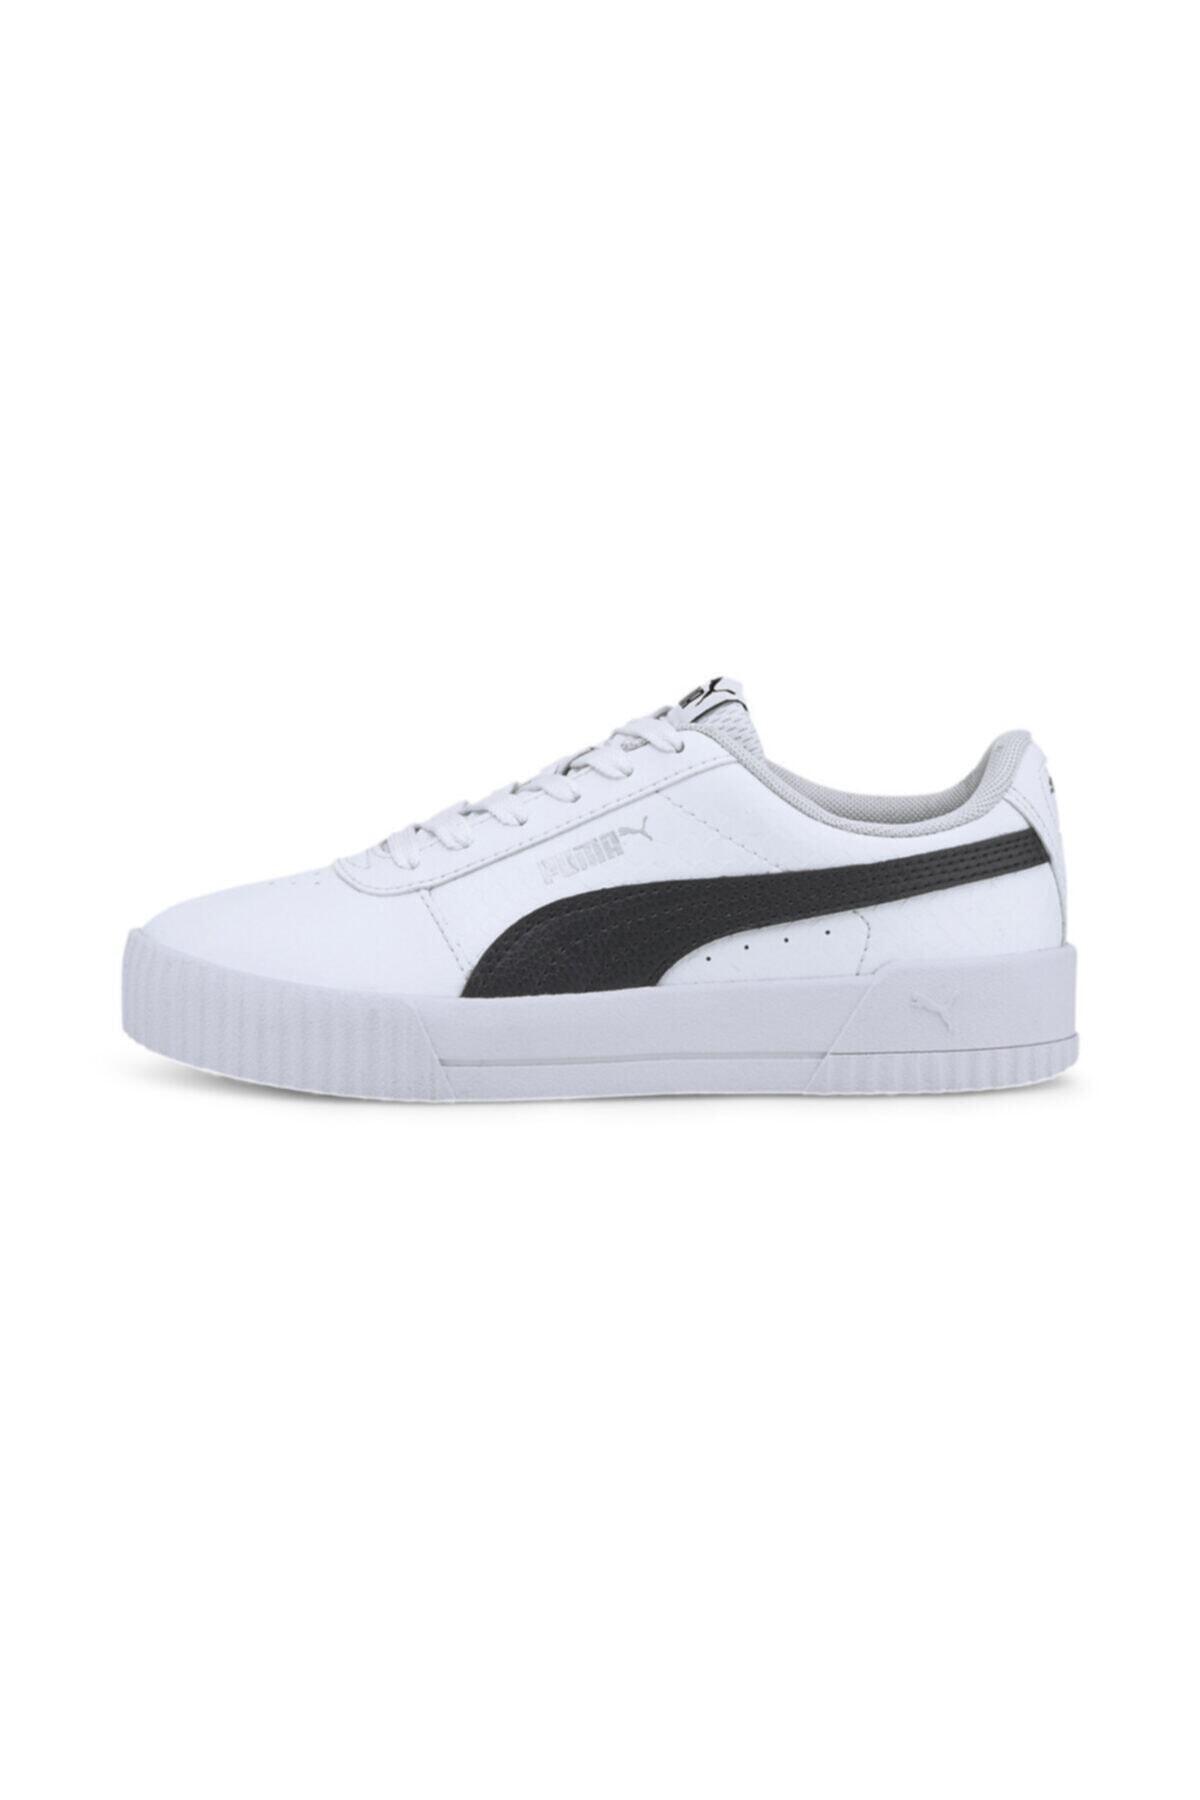 Puma Carina Snake Jr Unisex Siyah Beyaz Sneaker 1